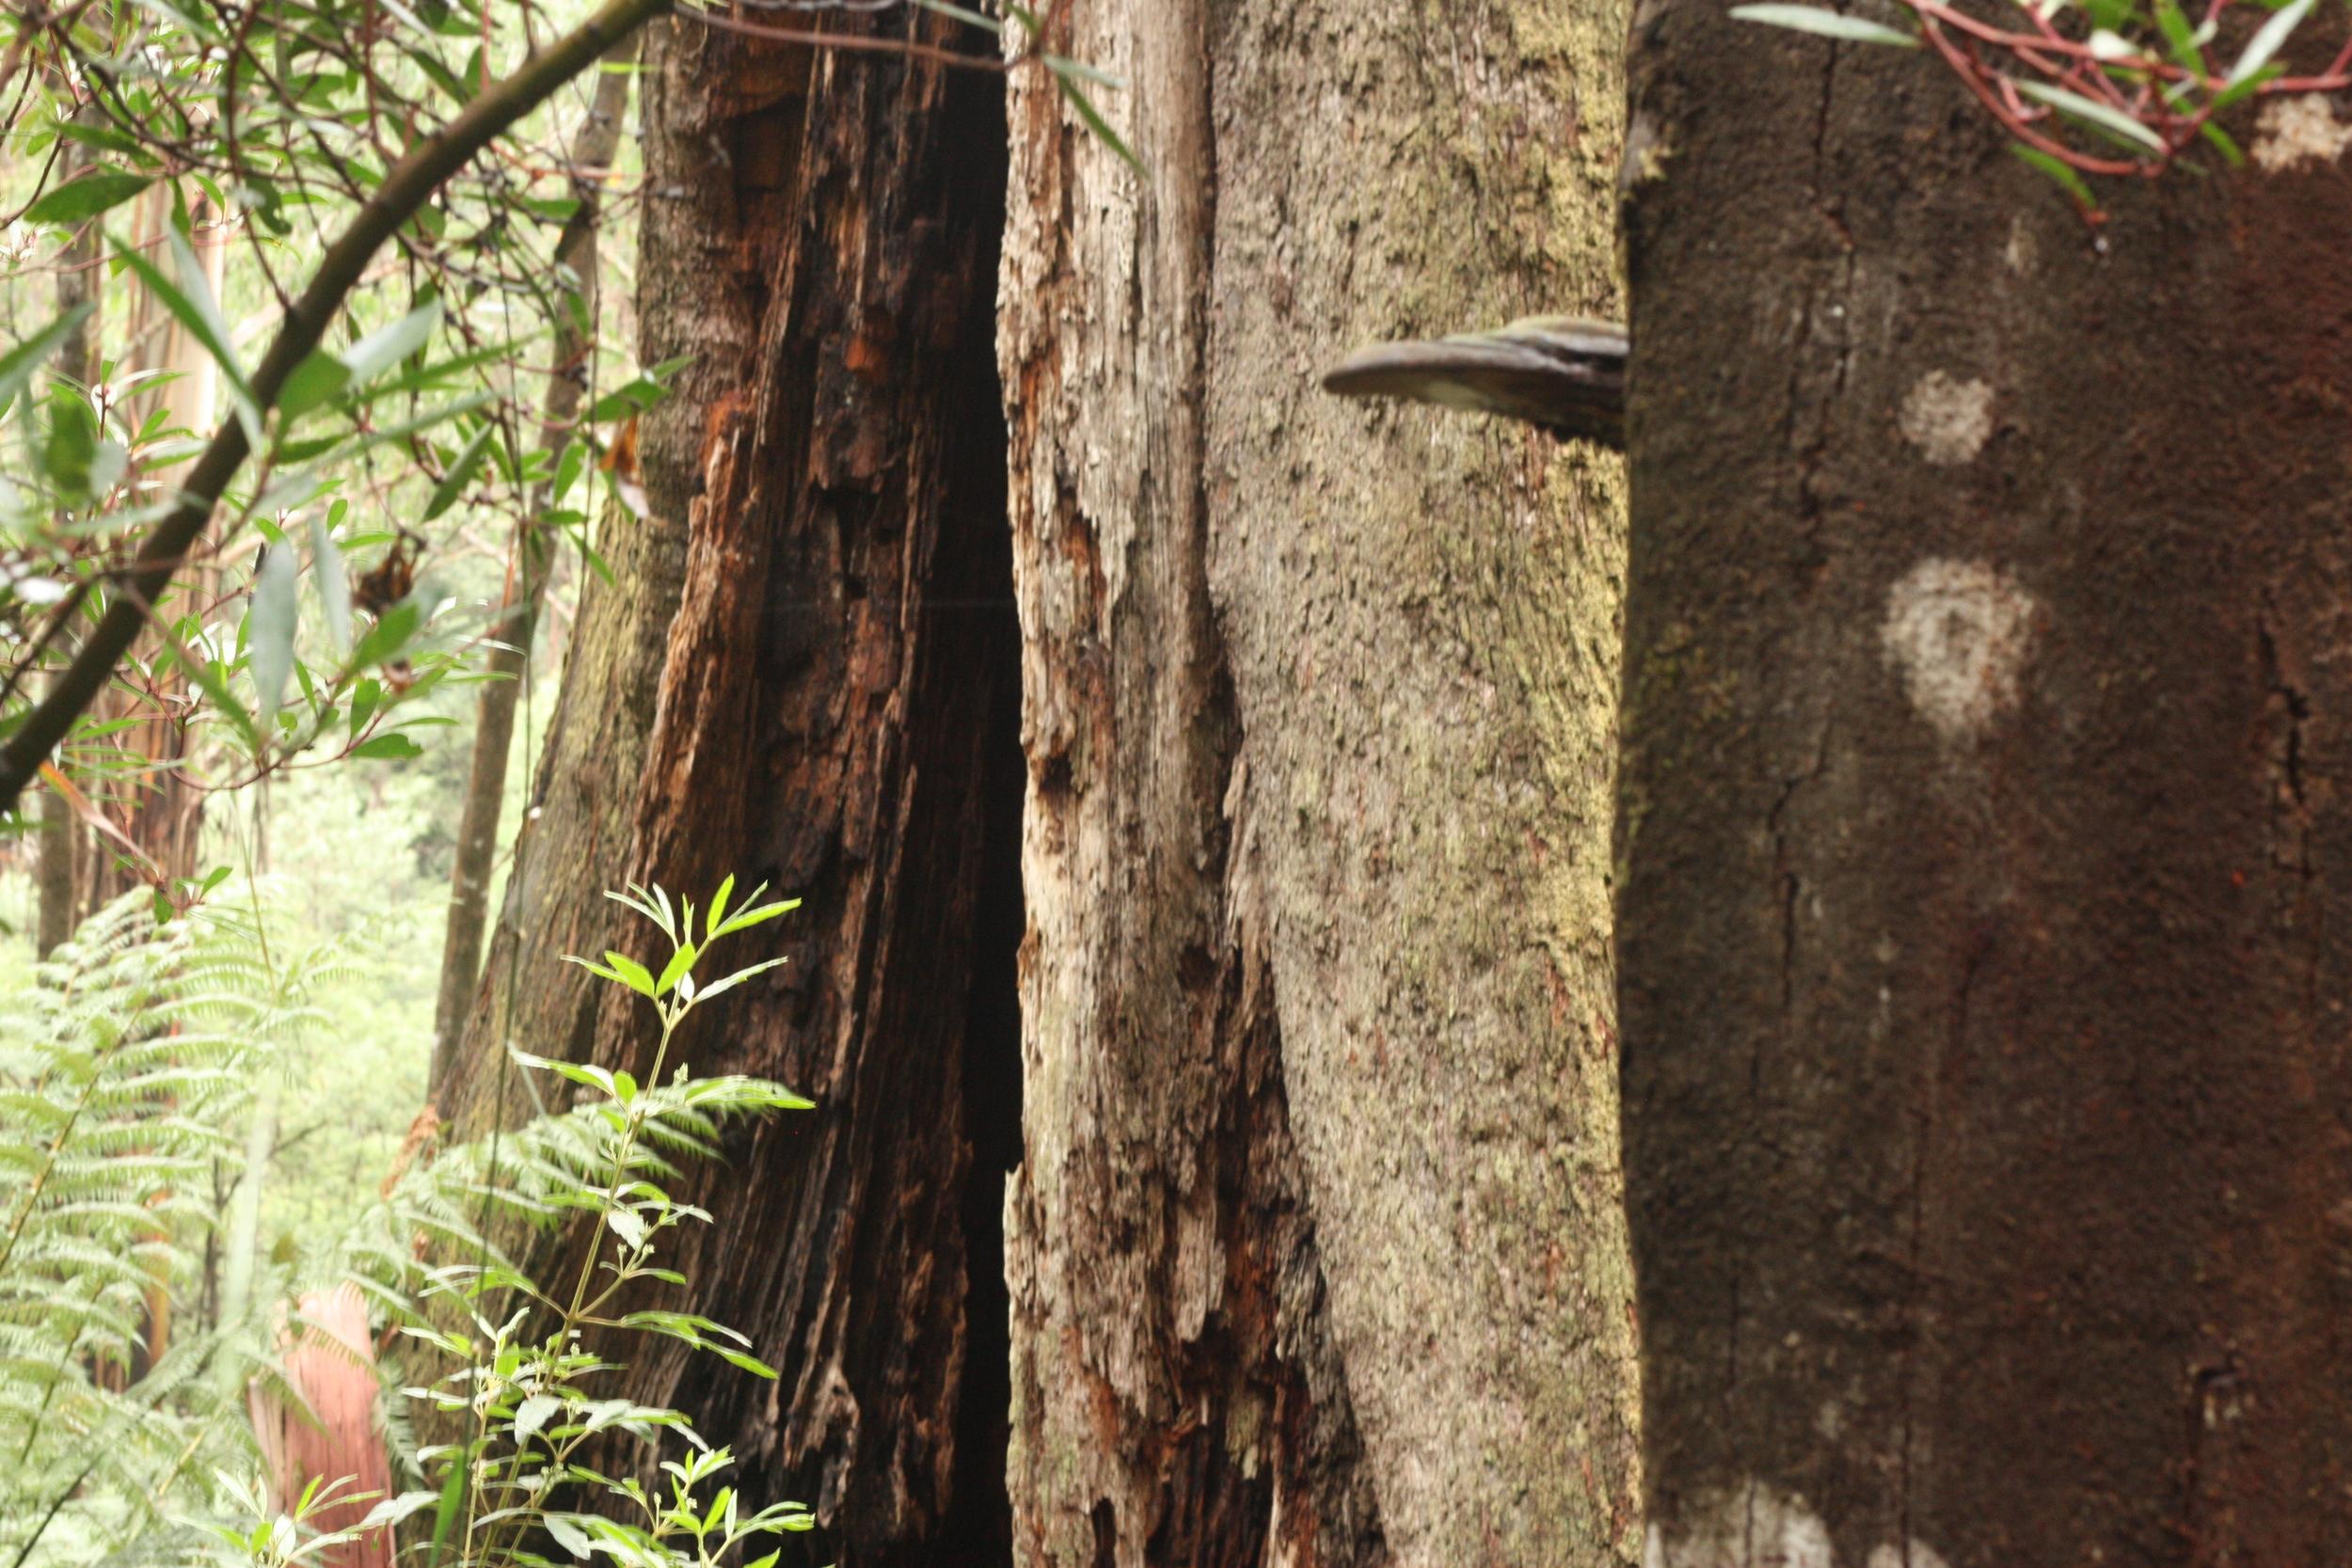 The Toolangi Forest. Photo: Alex Mullarky